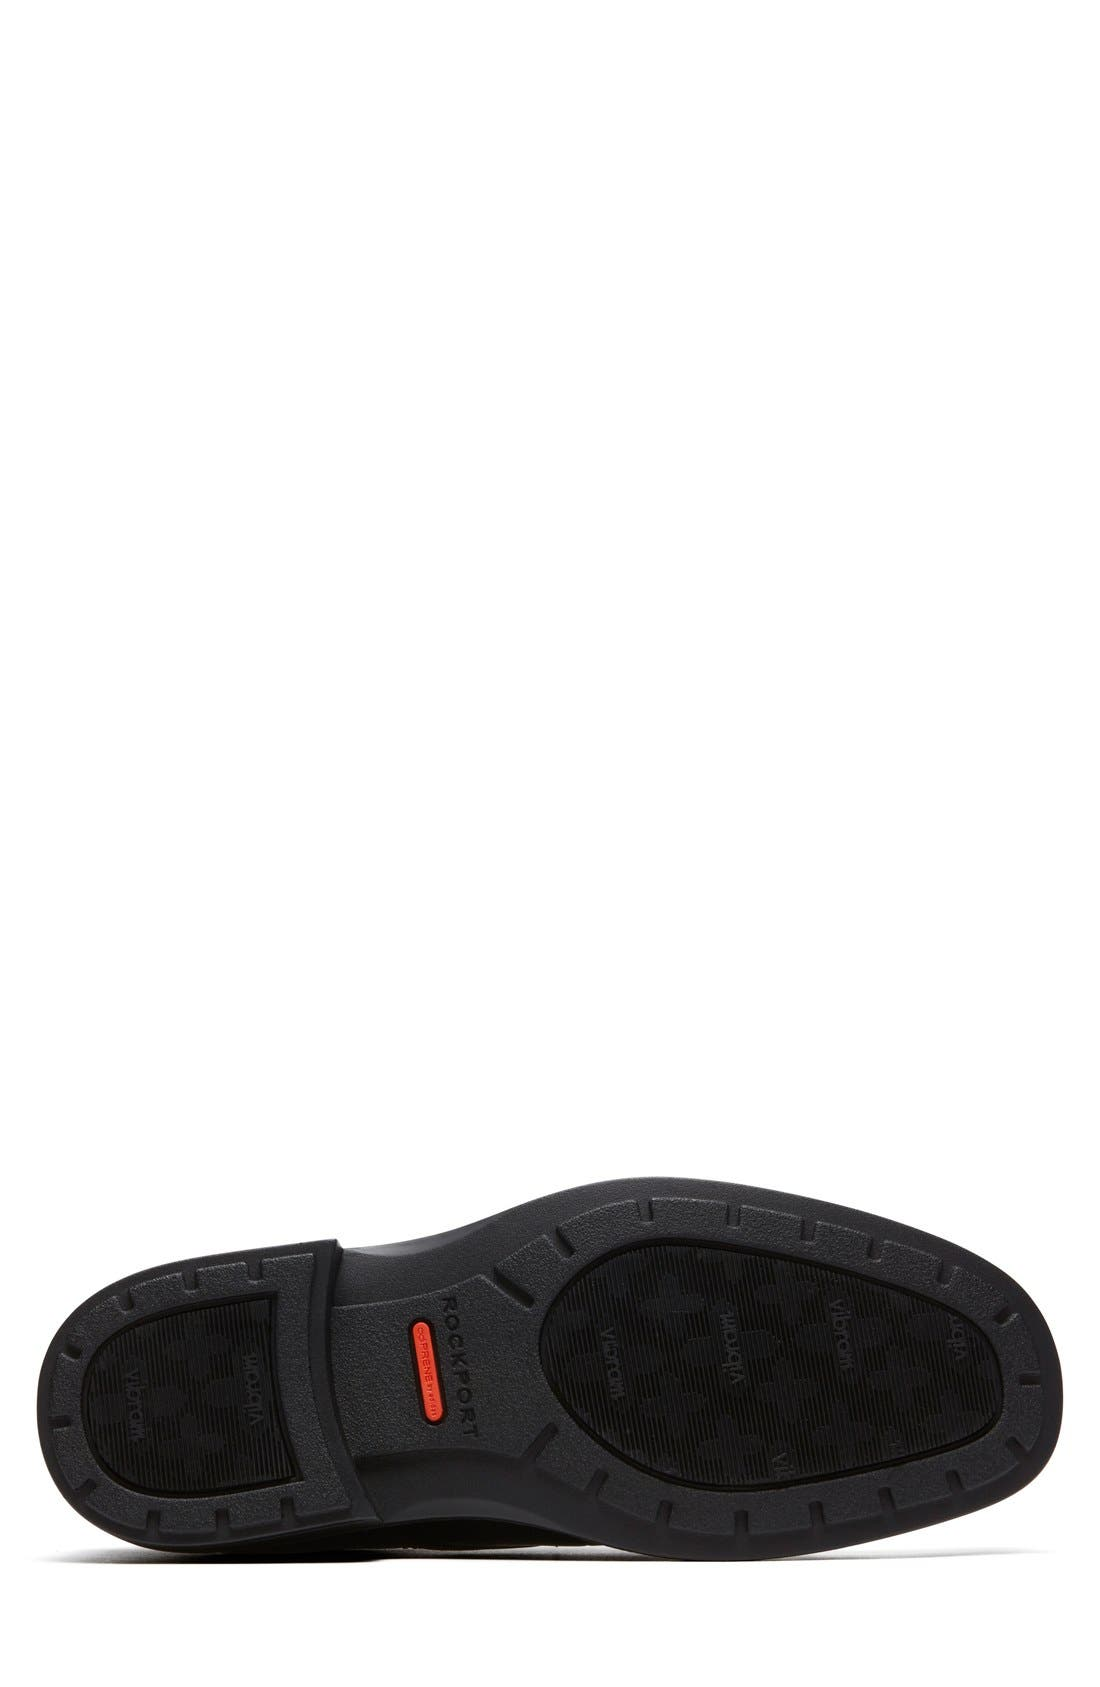 'DresSports Luxe' Cap Toe Derby,                             Alternate thumbnail 4, color,                             Black